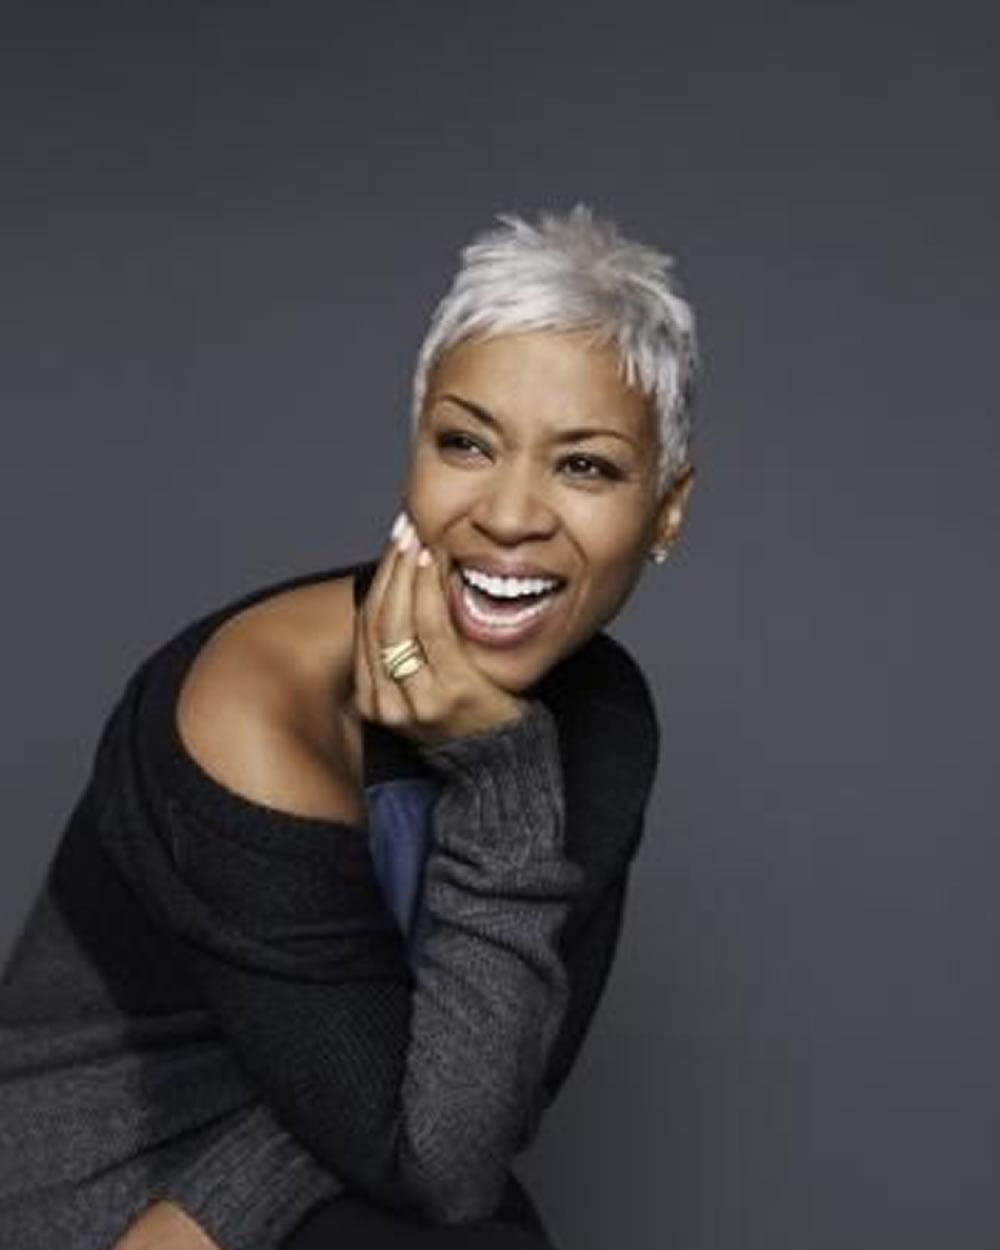 Short Hairstyles 2018 Black Female Over 50